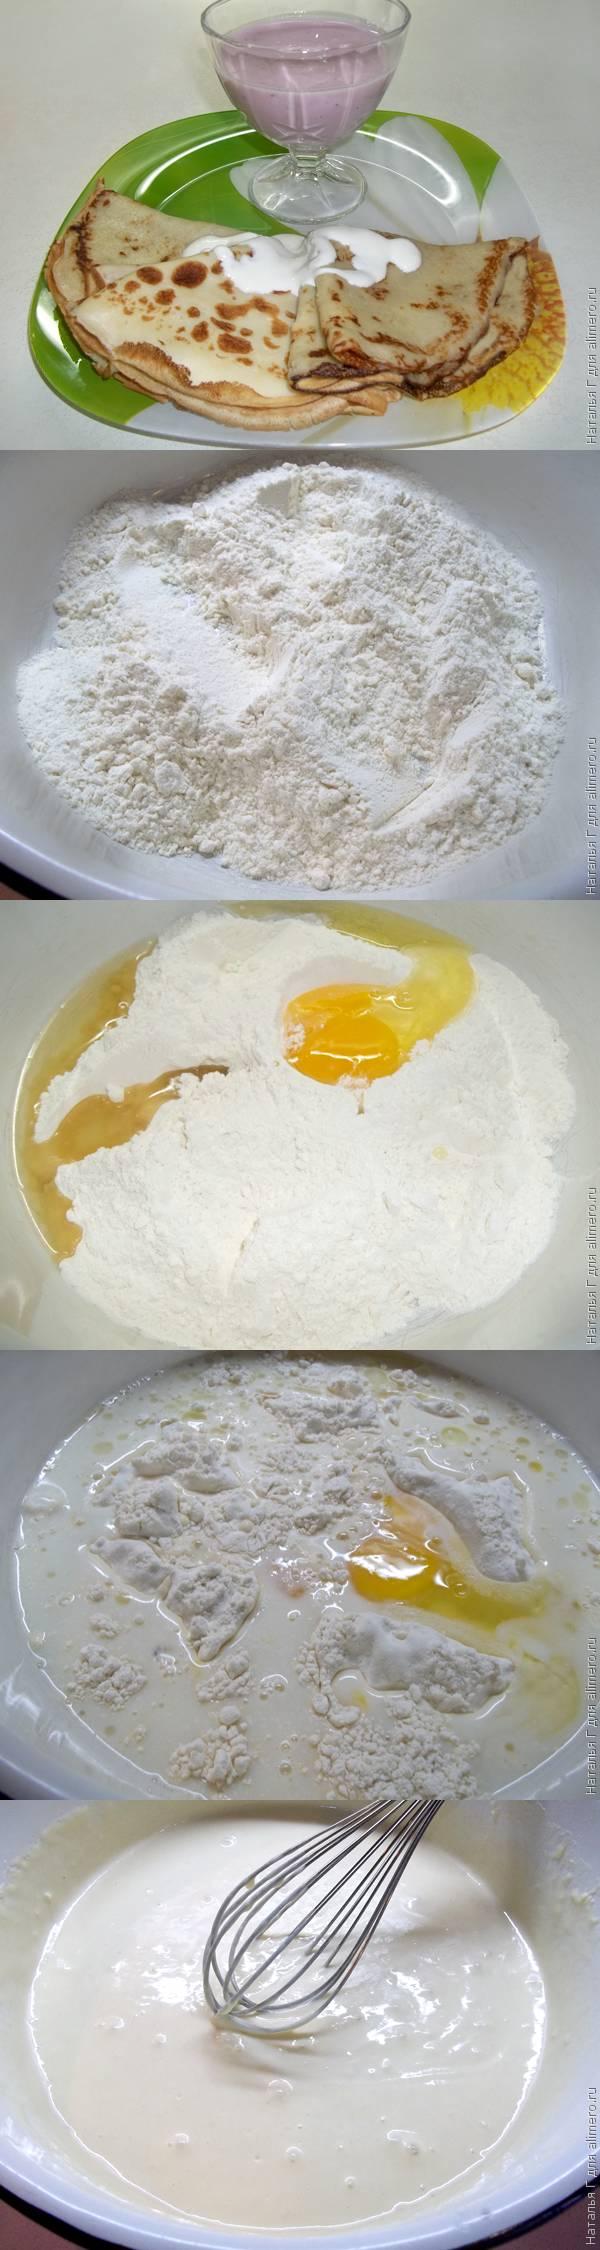 Блины ажурные рецепт пошаговые